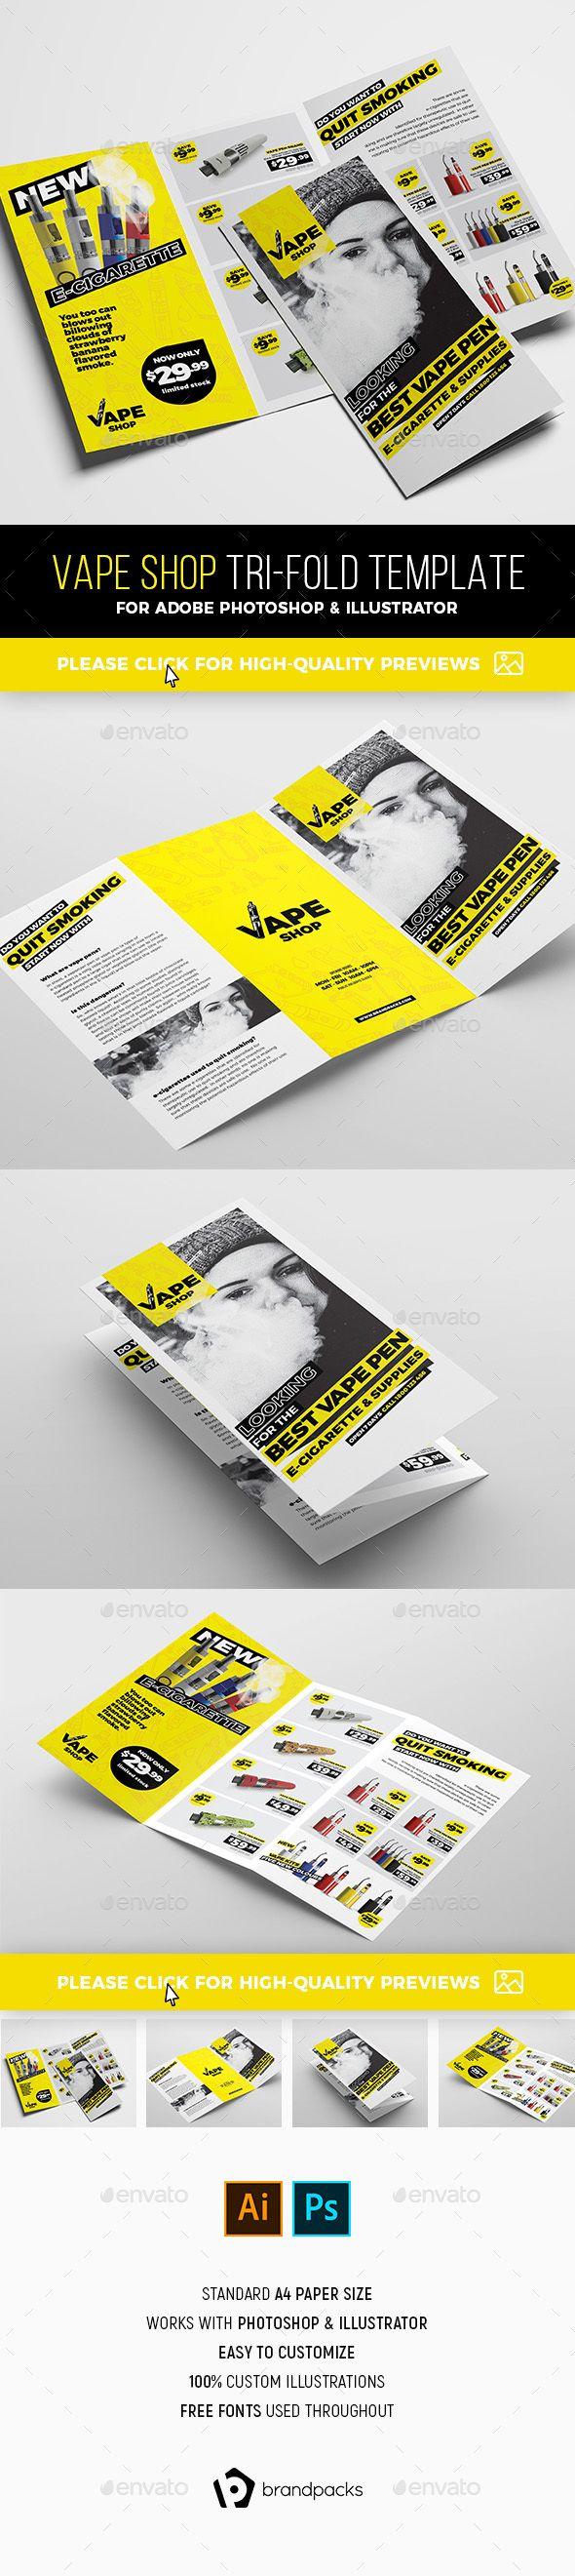 Vape Shop #Tri-Fold Brochure Template - Catalogs #Brochures